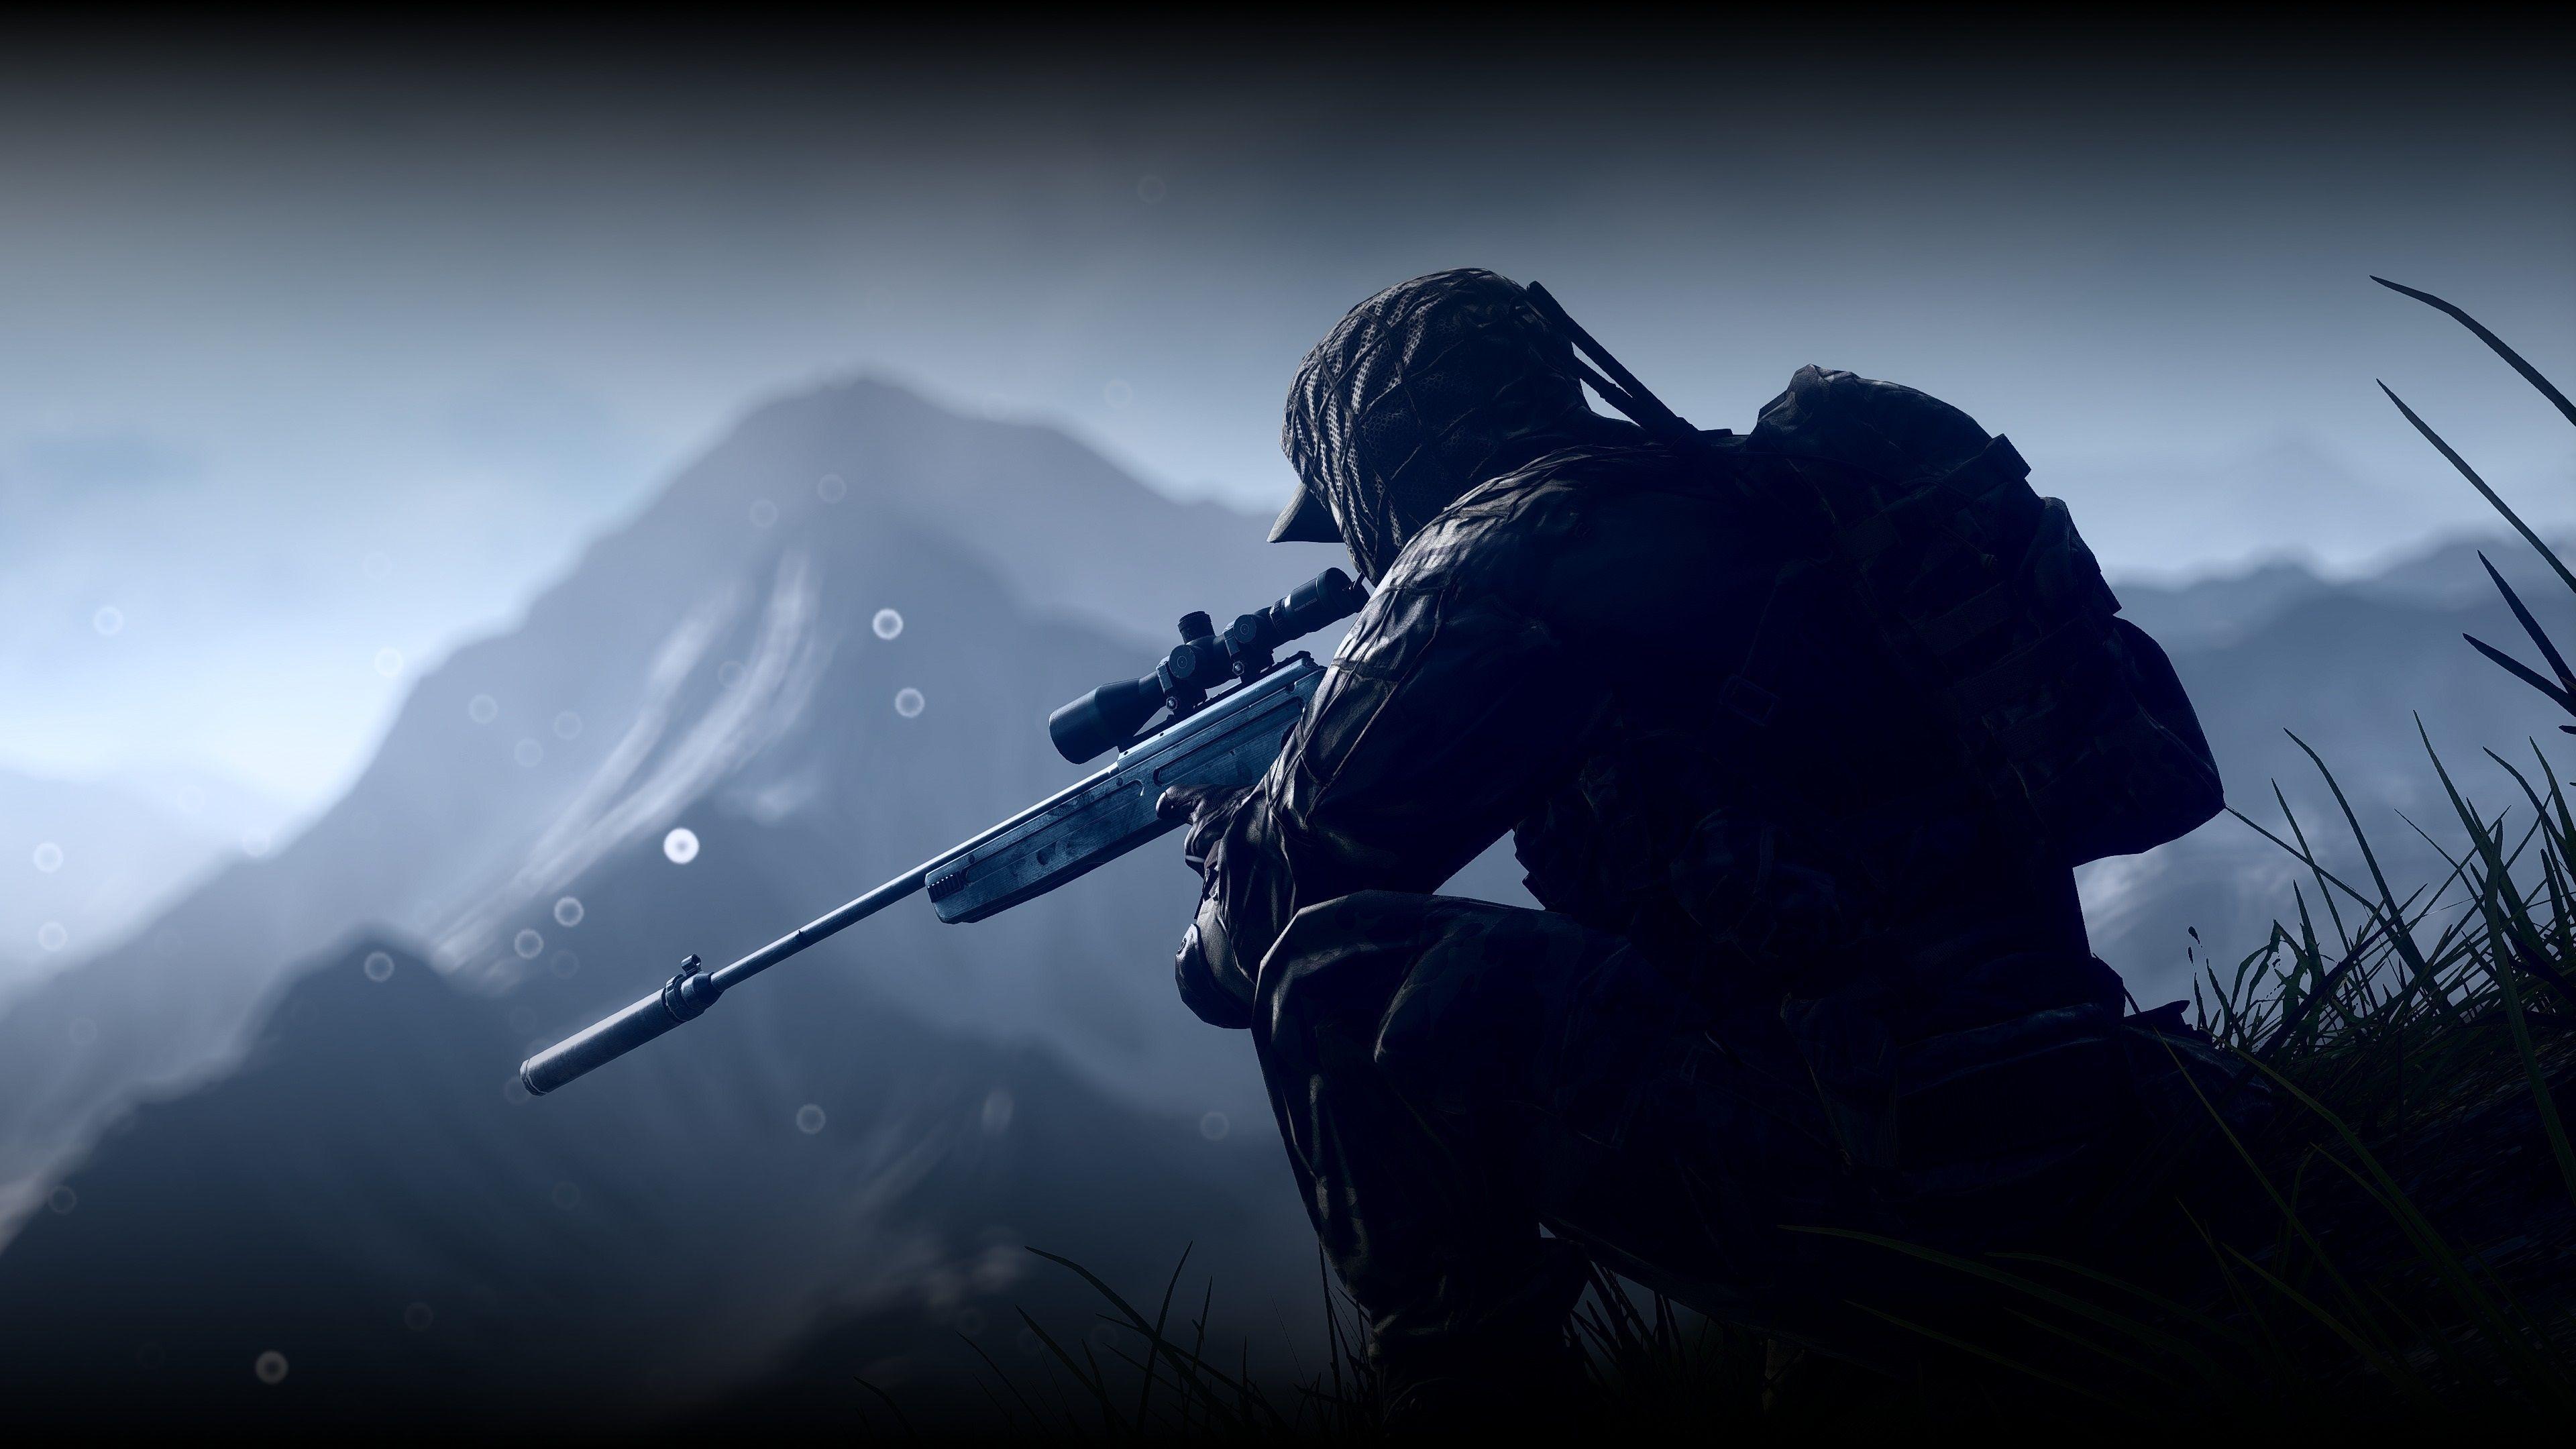 Картинки снайперов на аватарку, днем